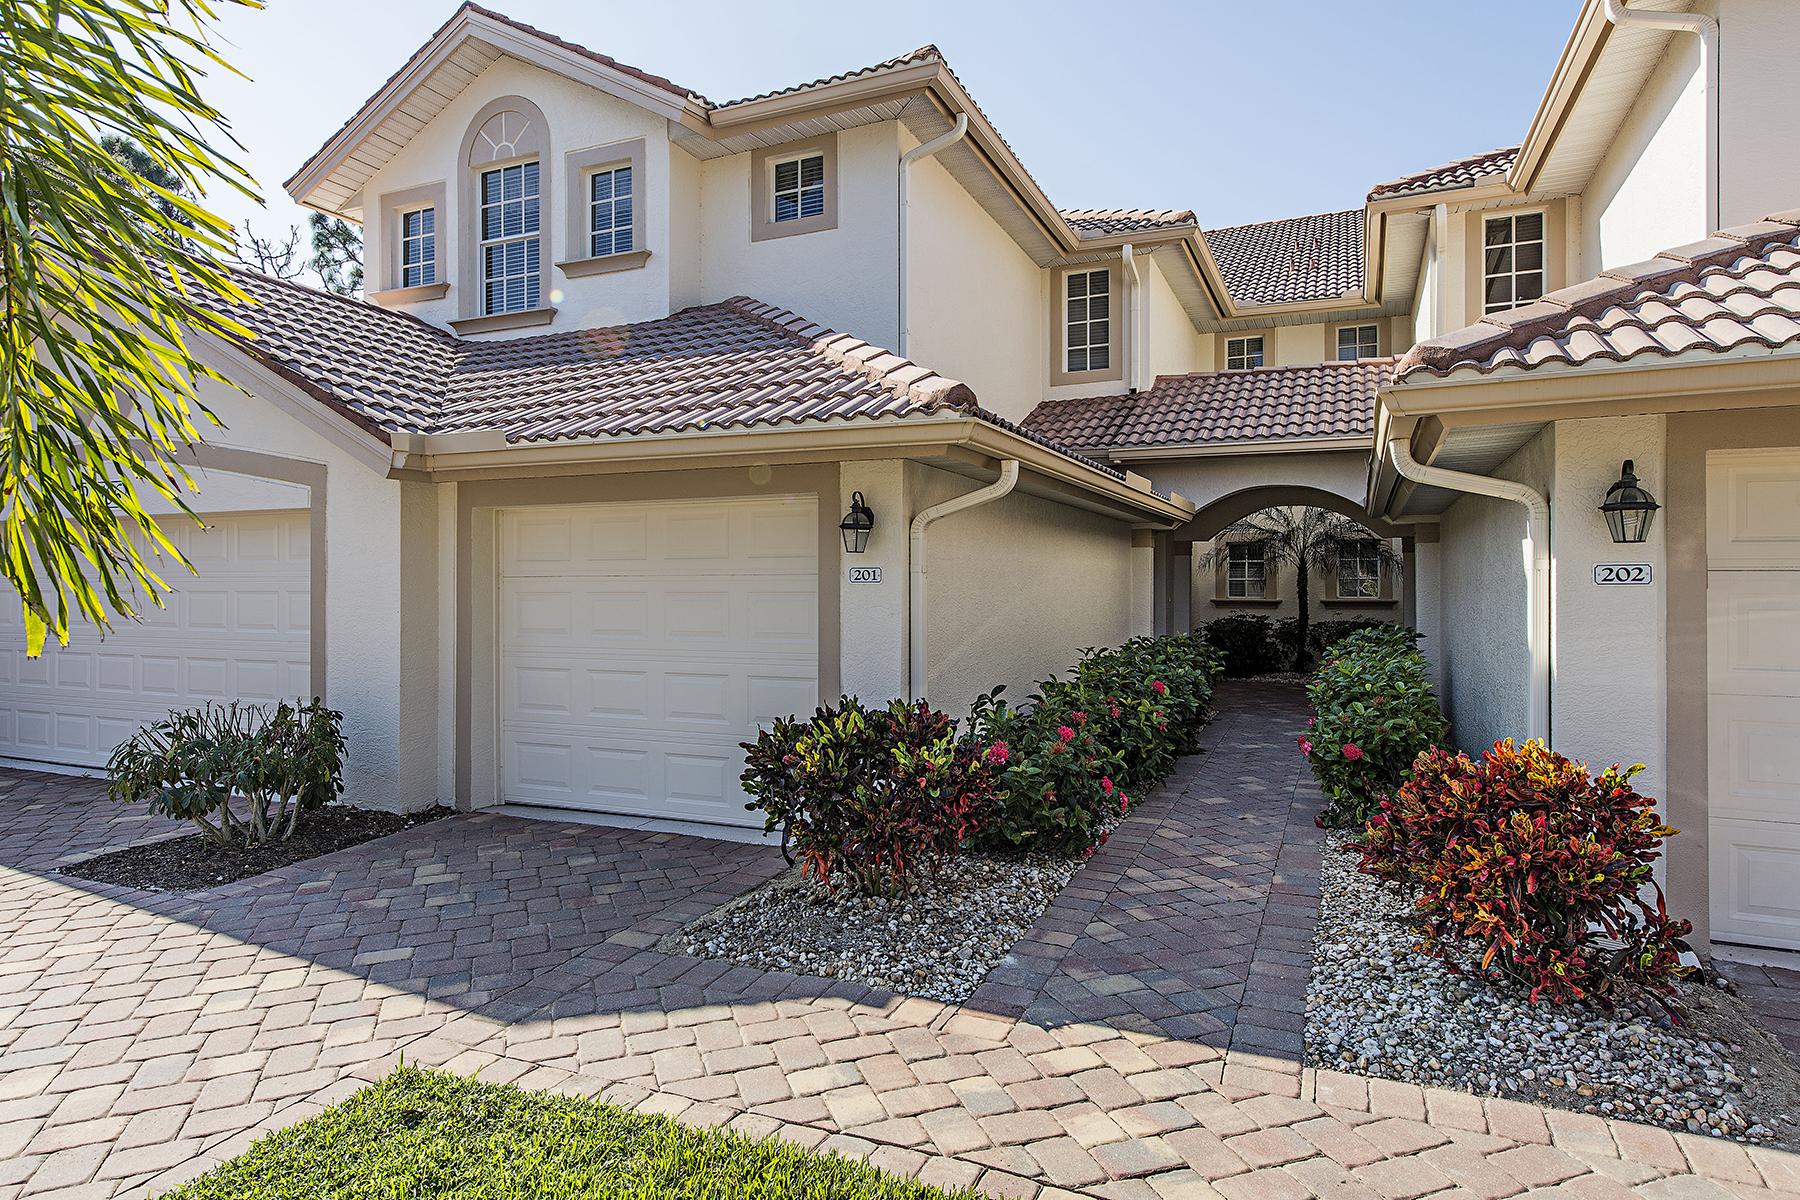 Condominium for Sale at MORNINGSIDE 23166 Rosedale Dr 201 Estero, Florida, 34135 United States